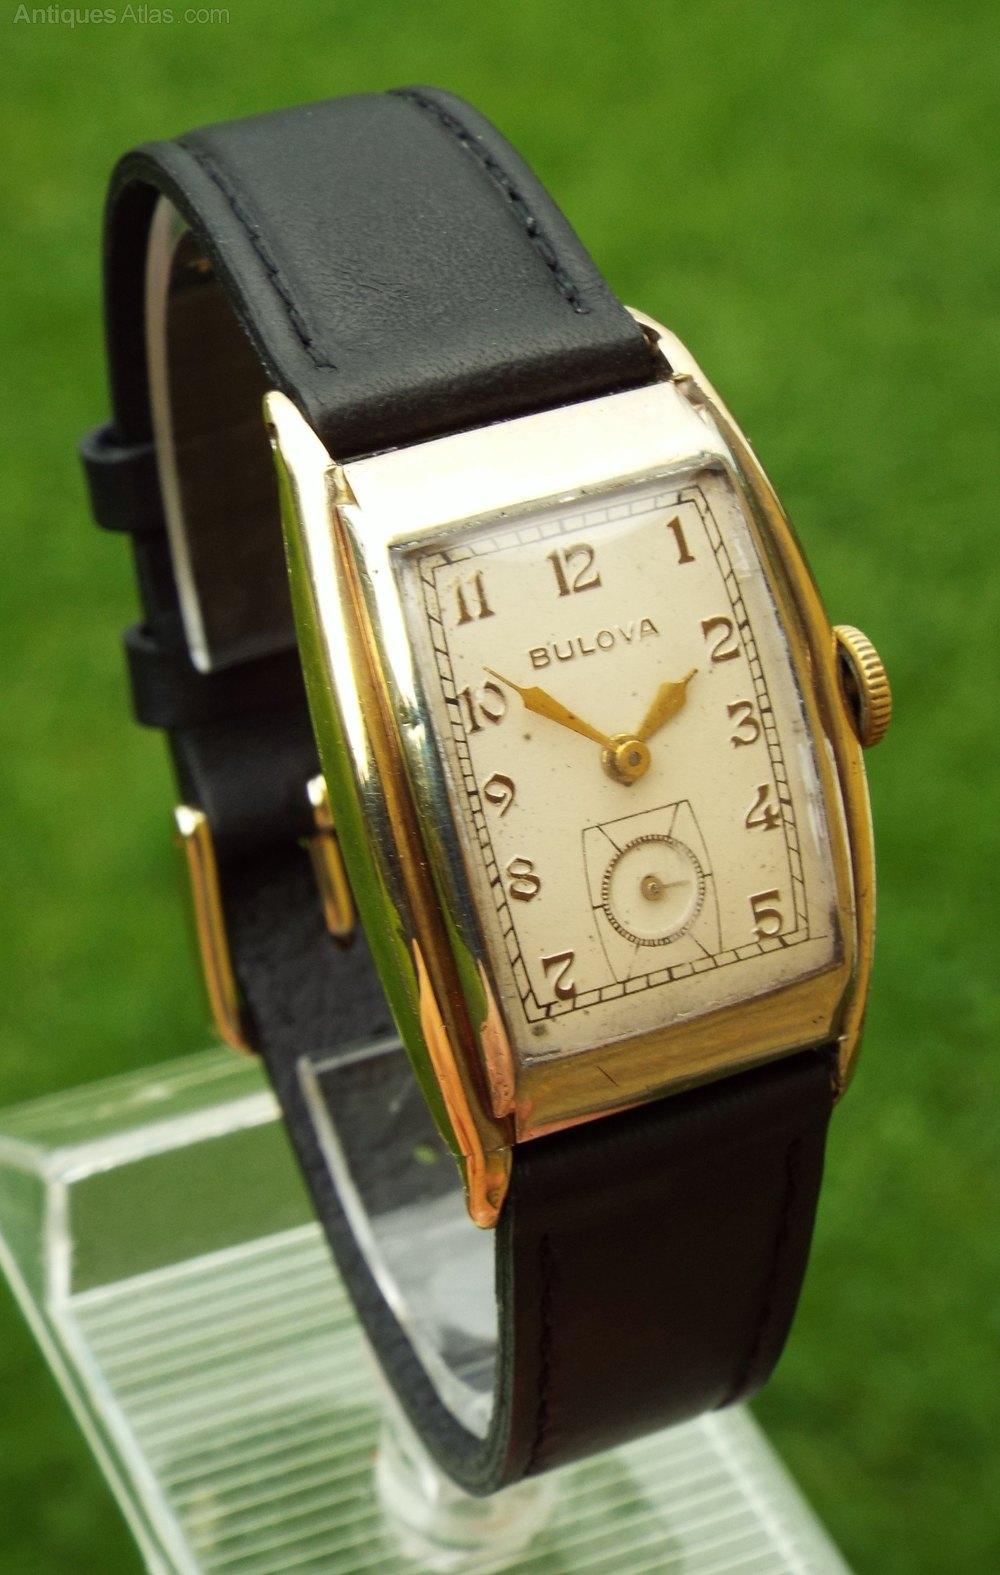 Antiques Atlas - Gents 1930s Bulova Wrist Watch